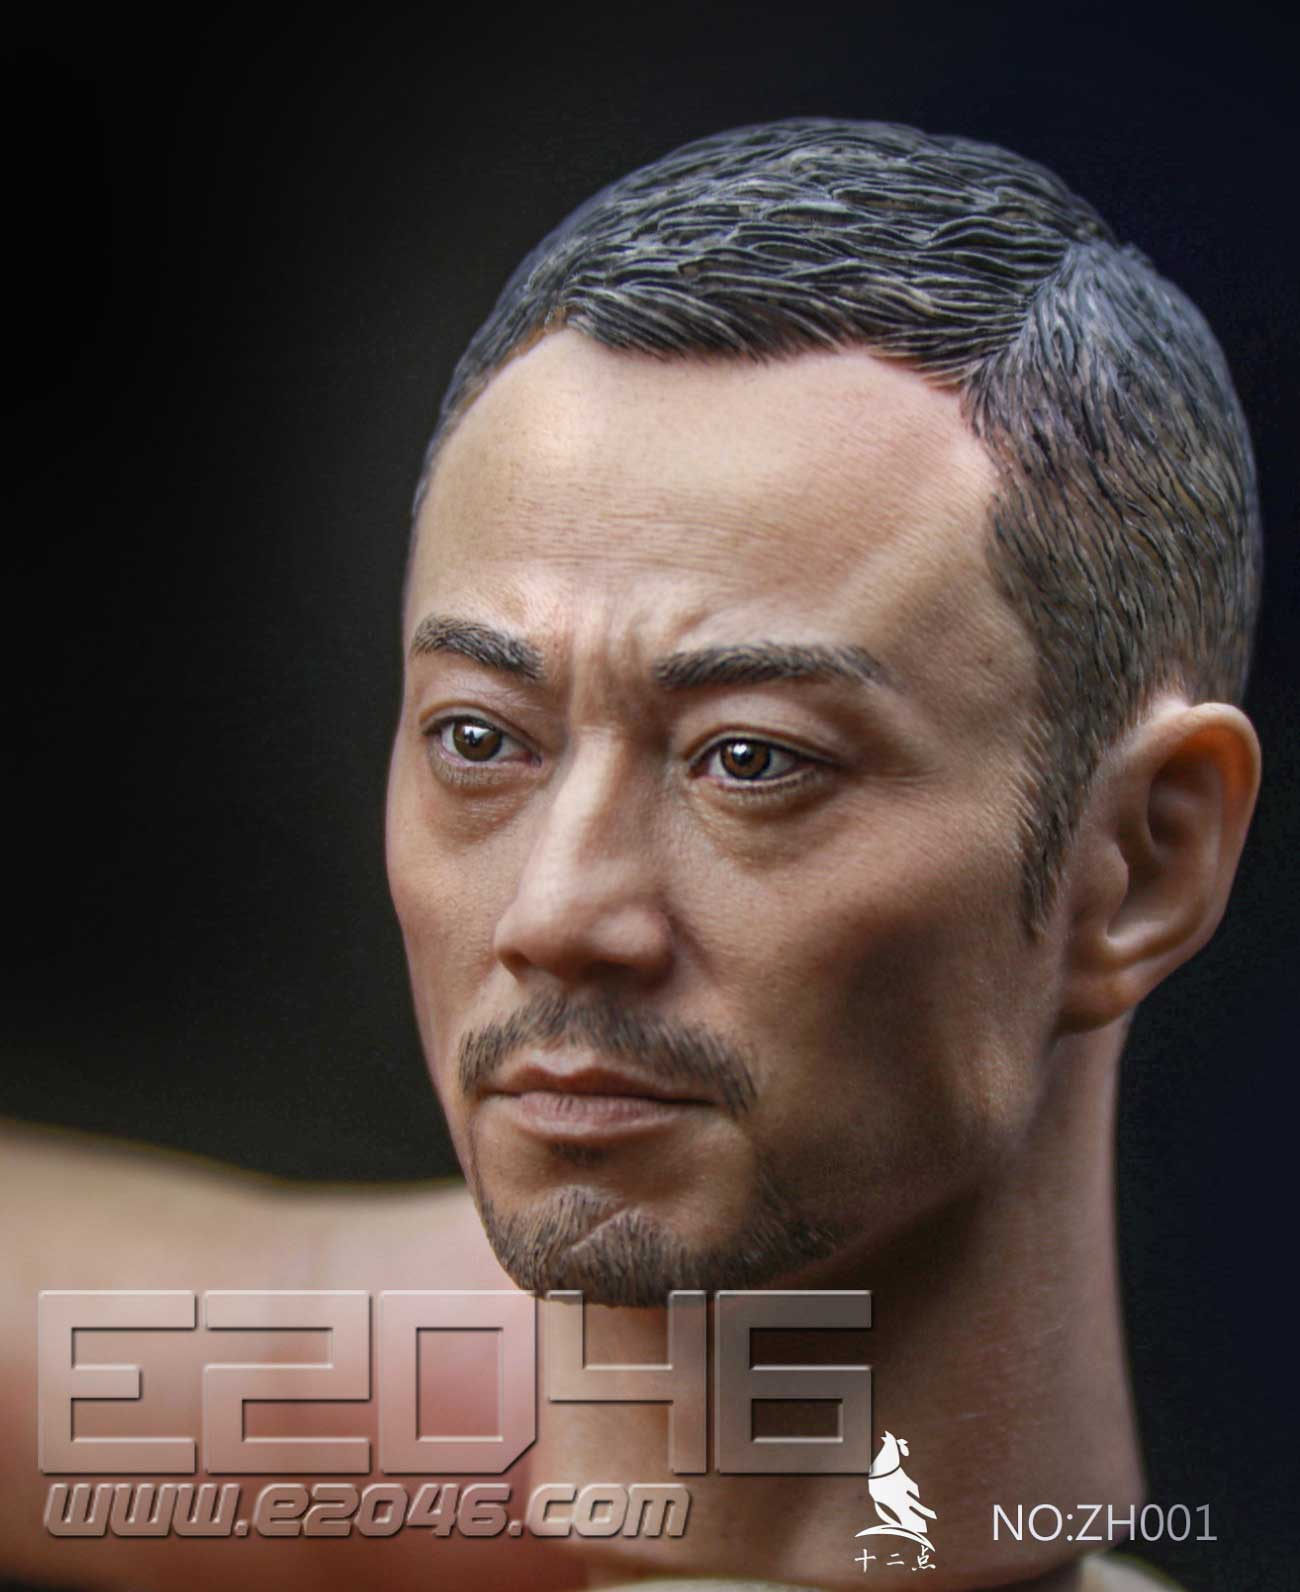 Tough Guy Head Sculpture (DOLL)